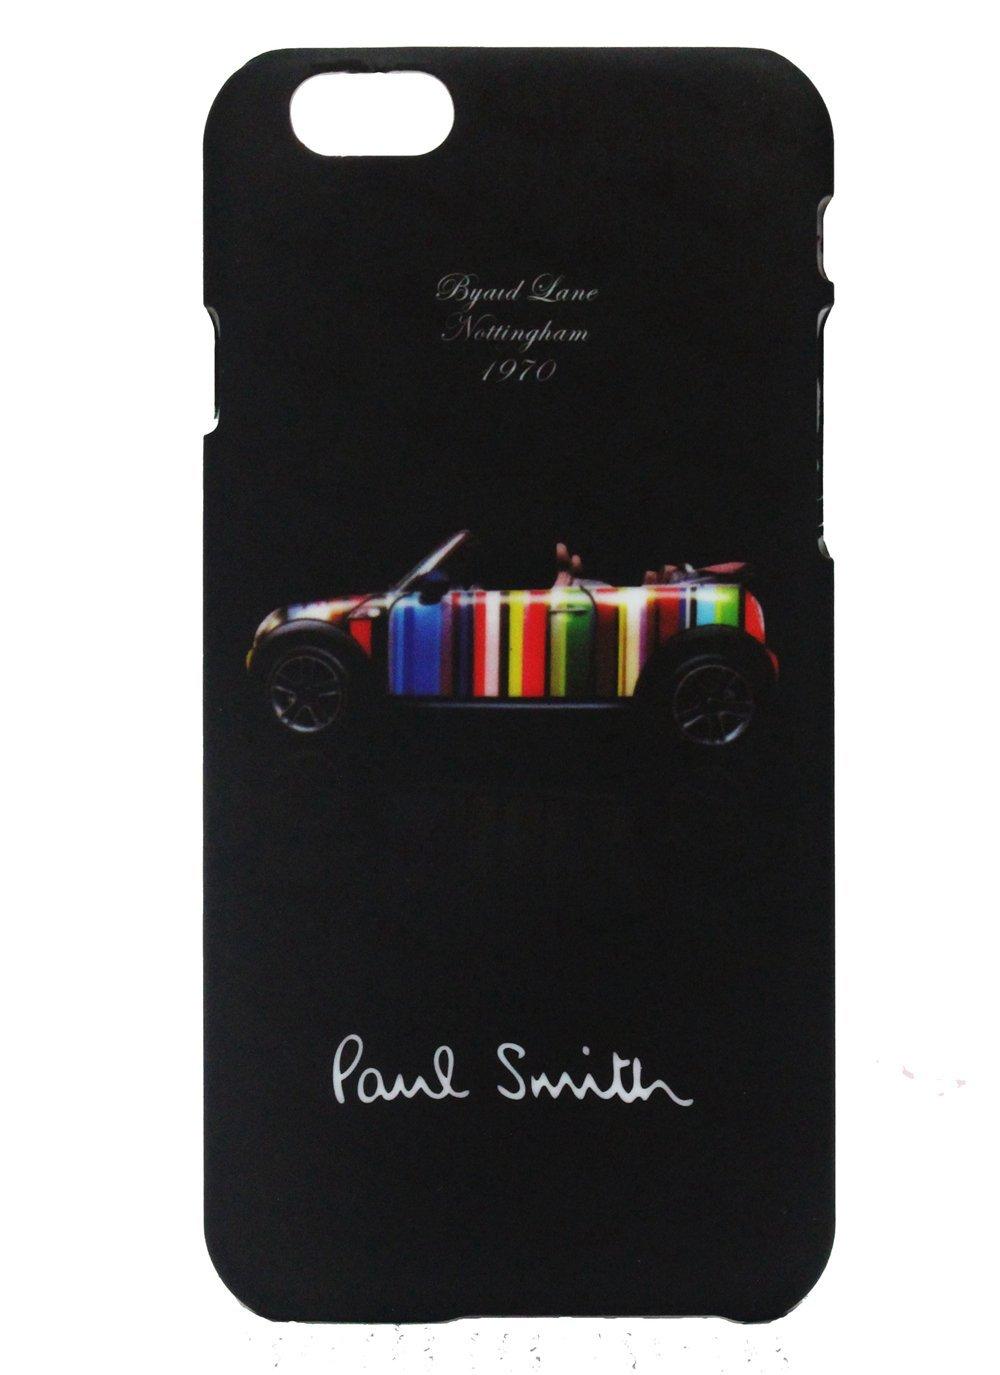 Paul Smith ポール・スミス iPhone 6 ハードケース